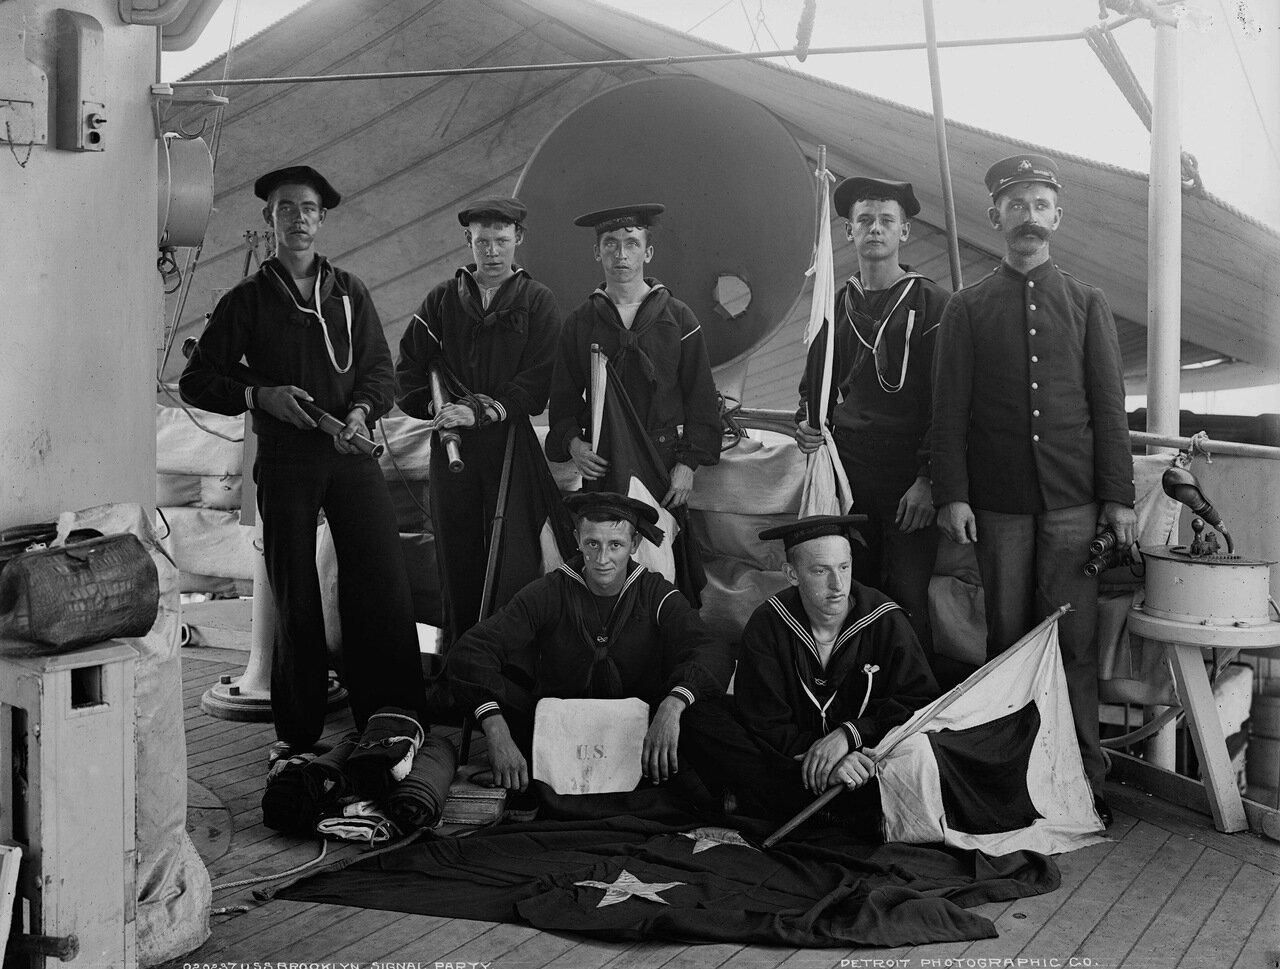 USS New York, сигнальщики, ca.1896-99 гг.